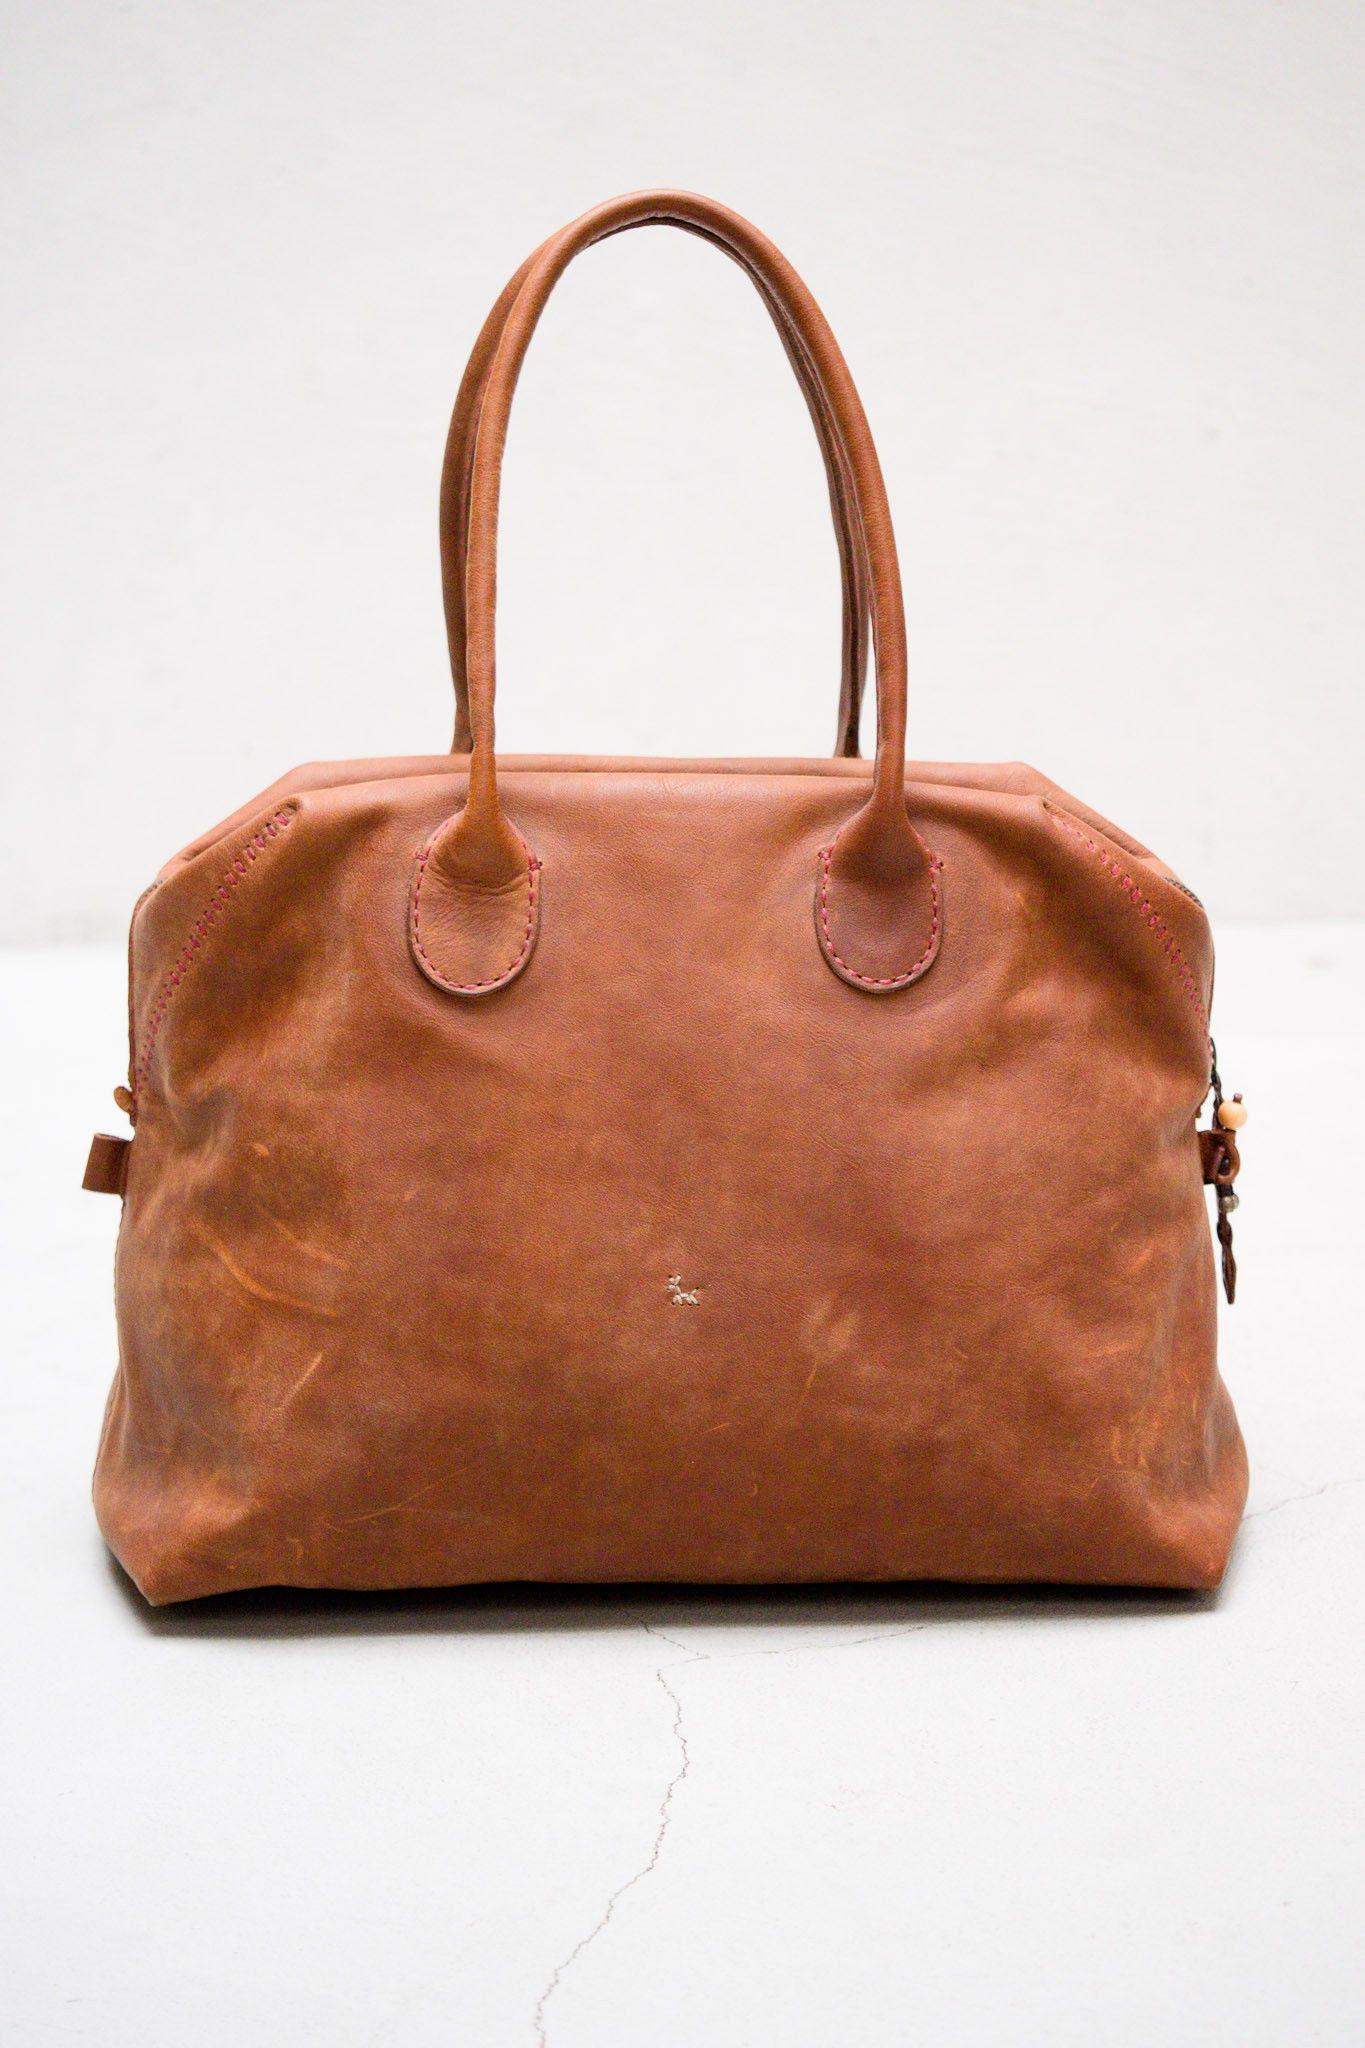 Lancaster bag henry cuir henry cuir pinterest bags